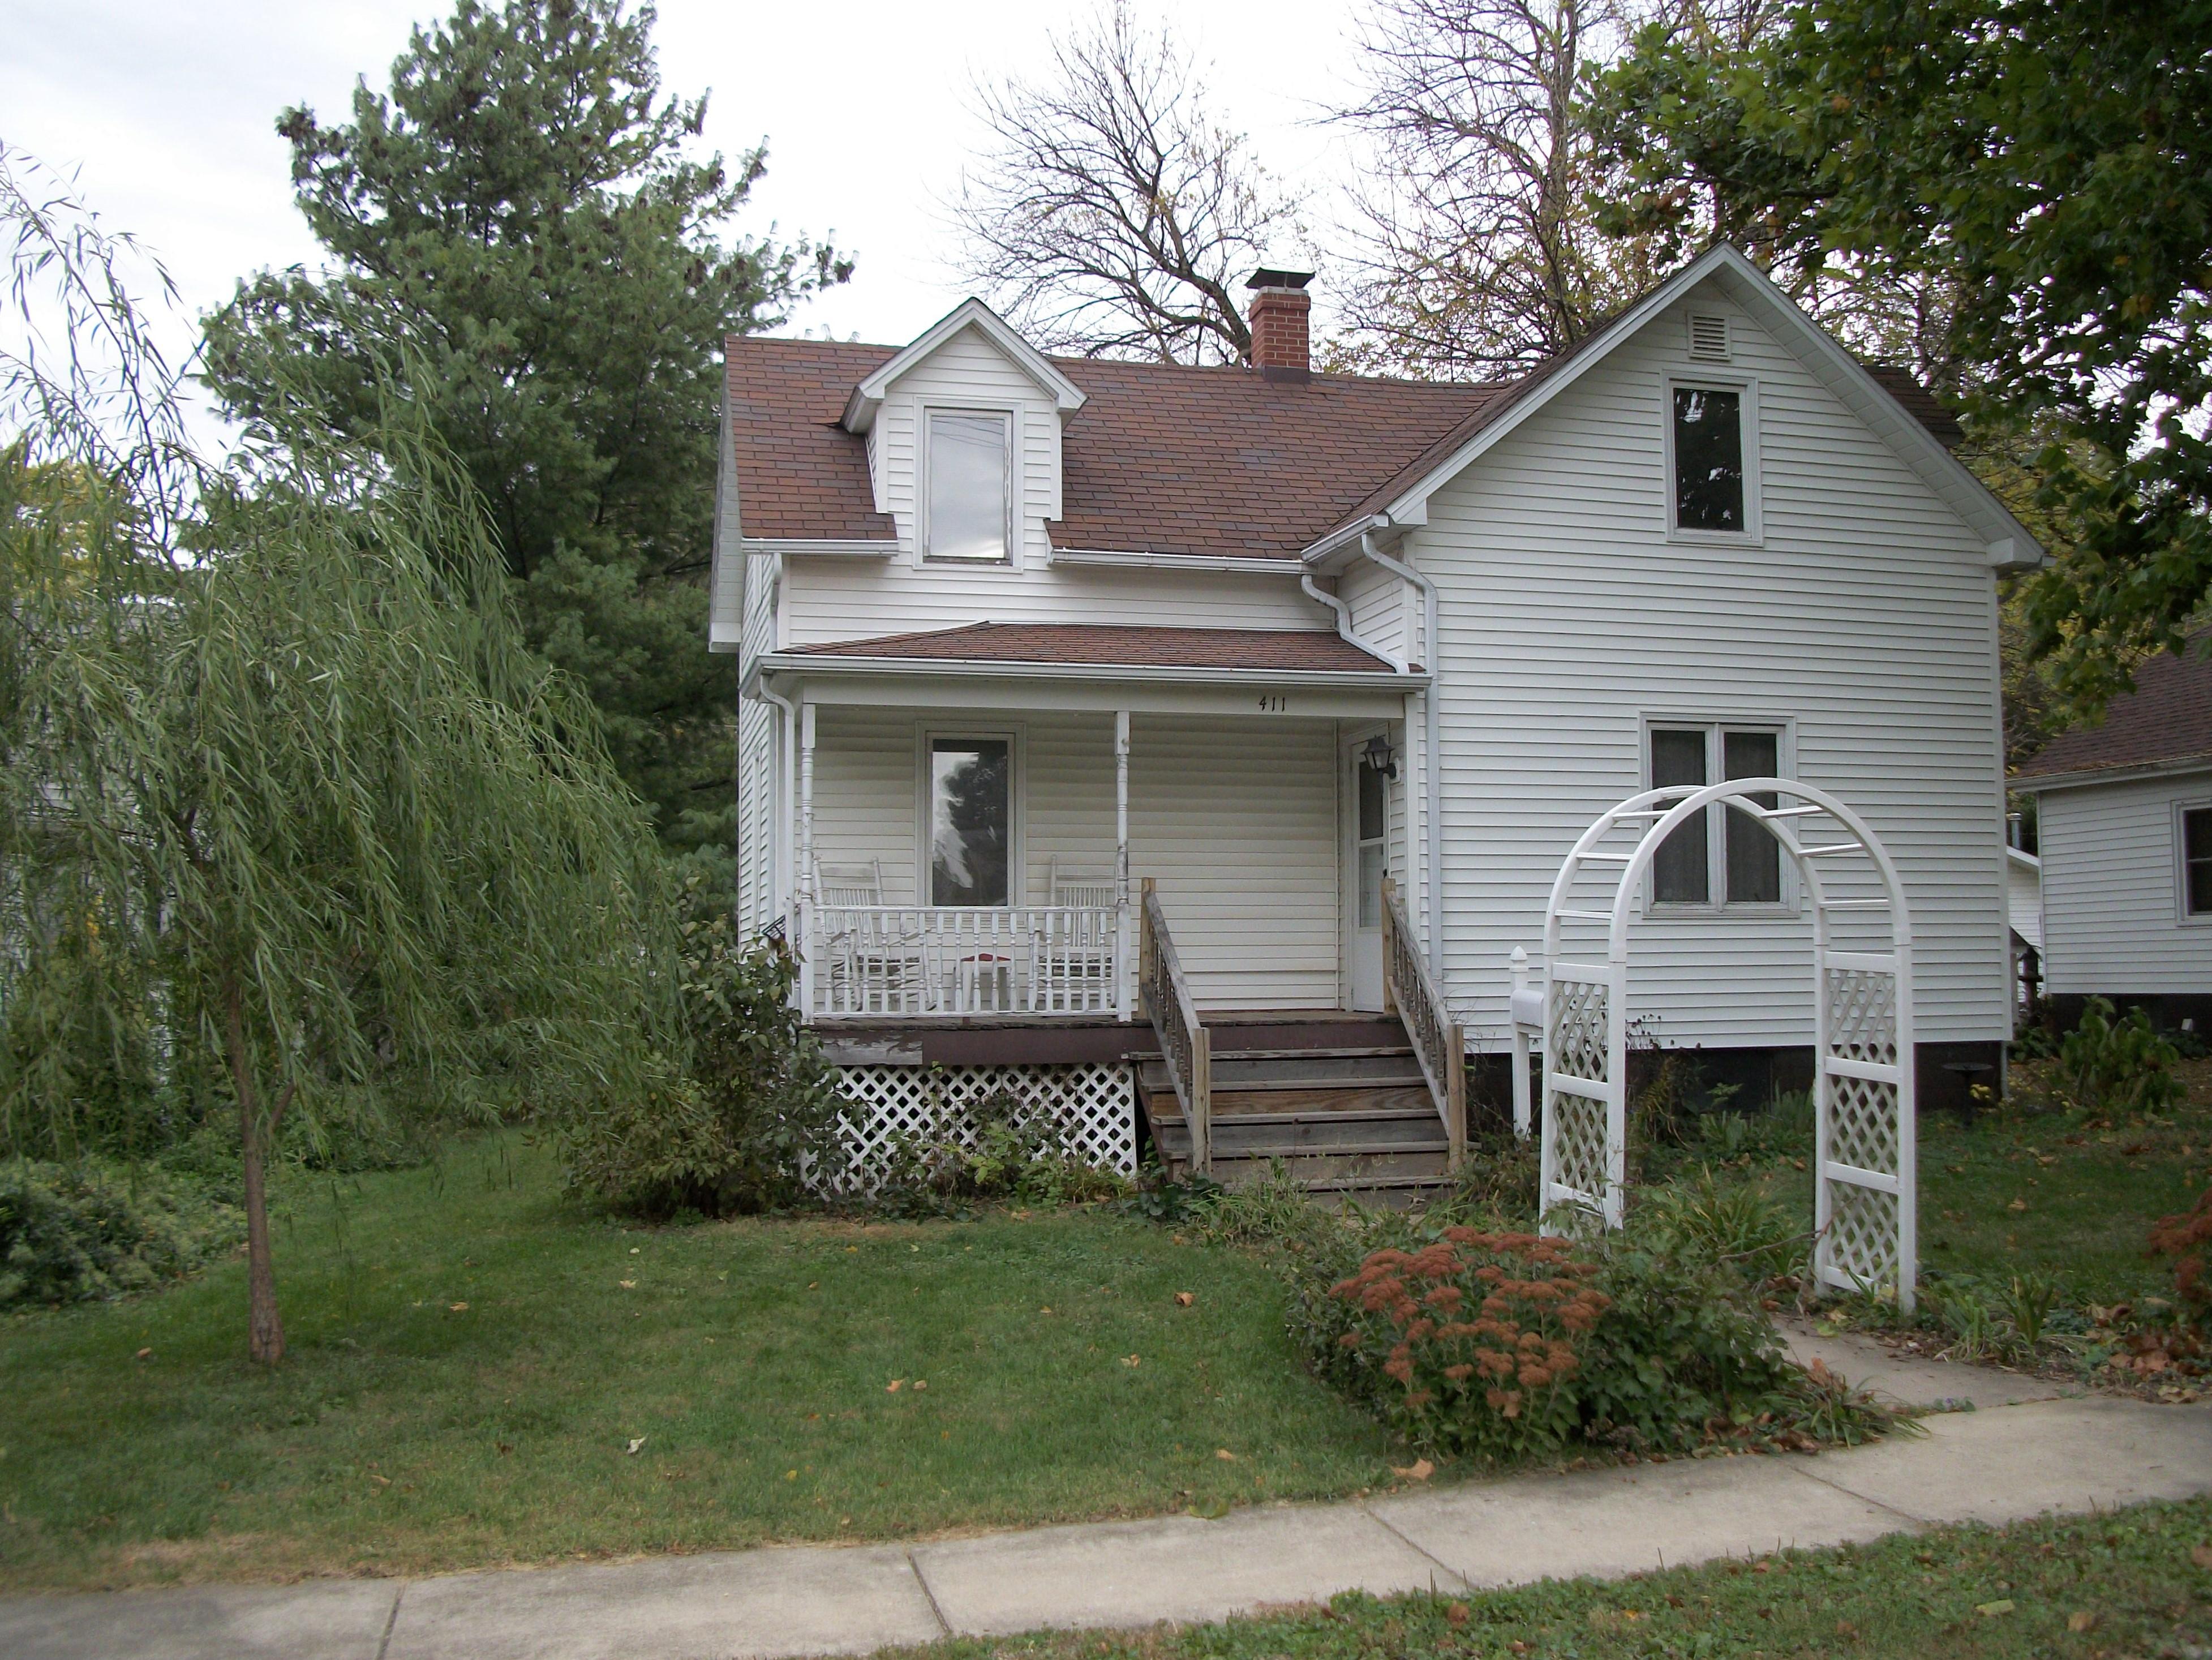 411 E Ottawa, Paxton, Illinois 60957